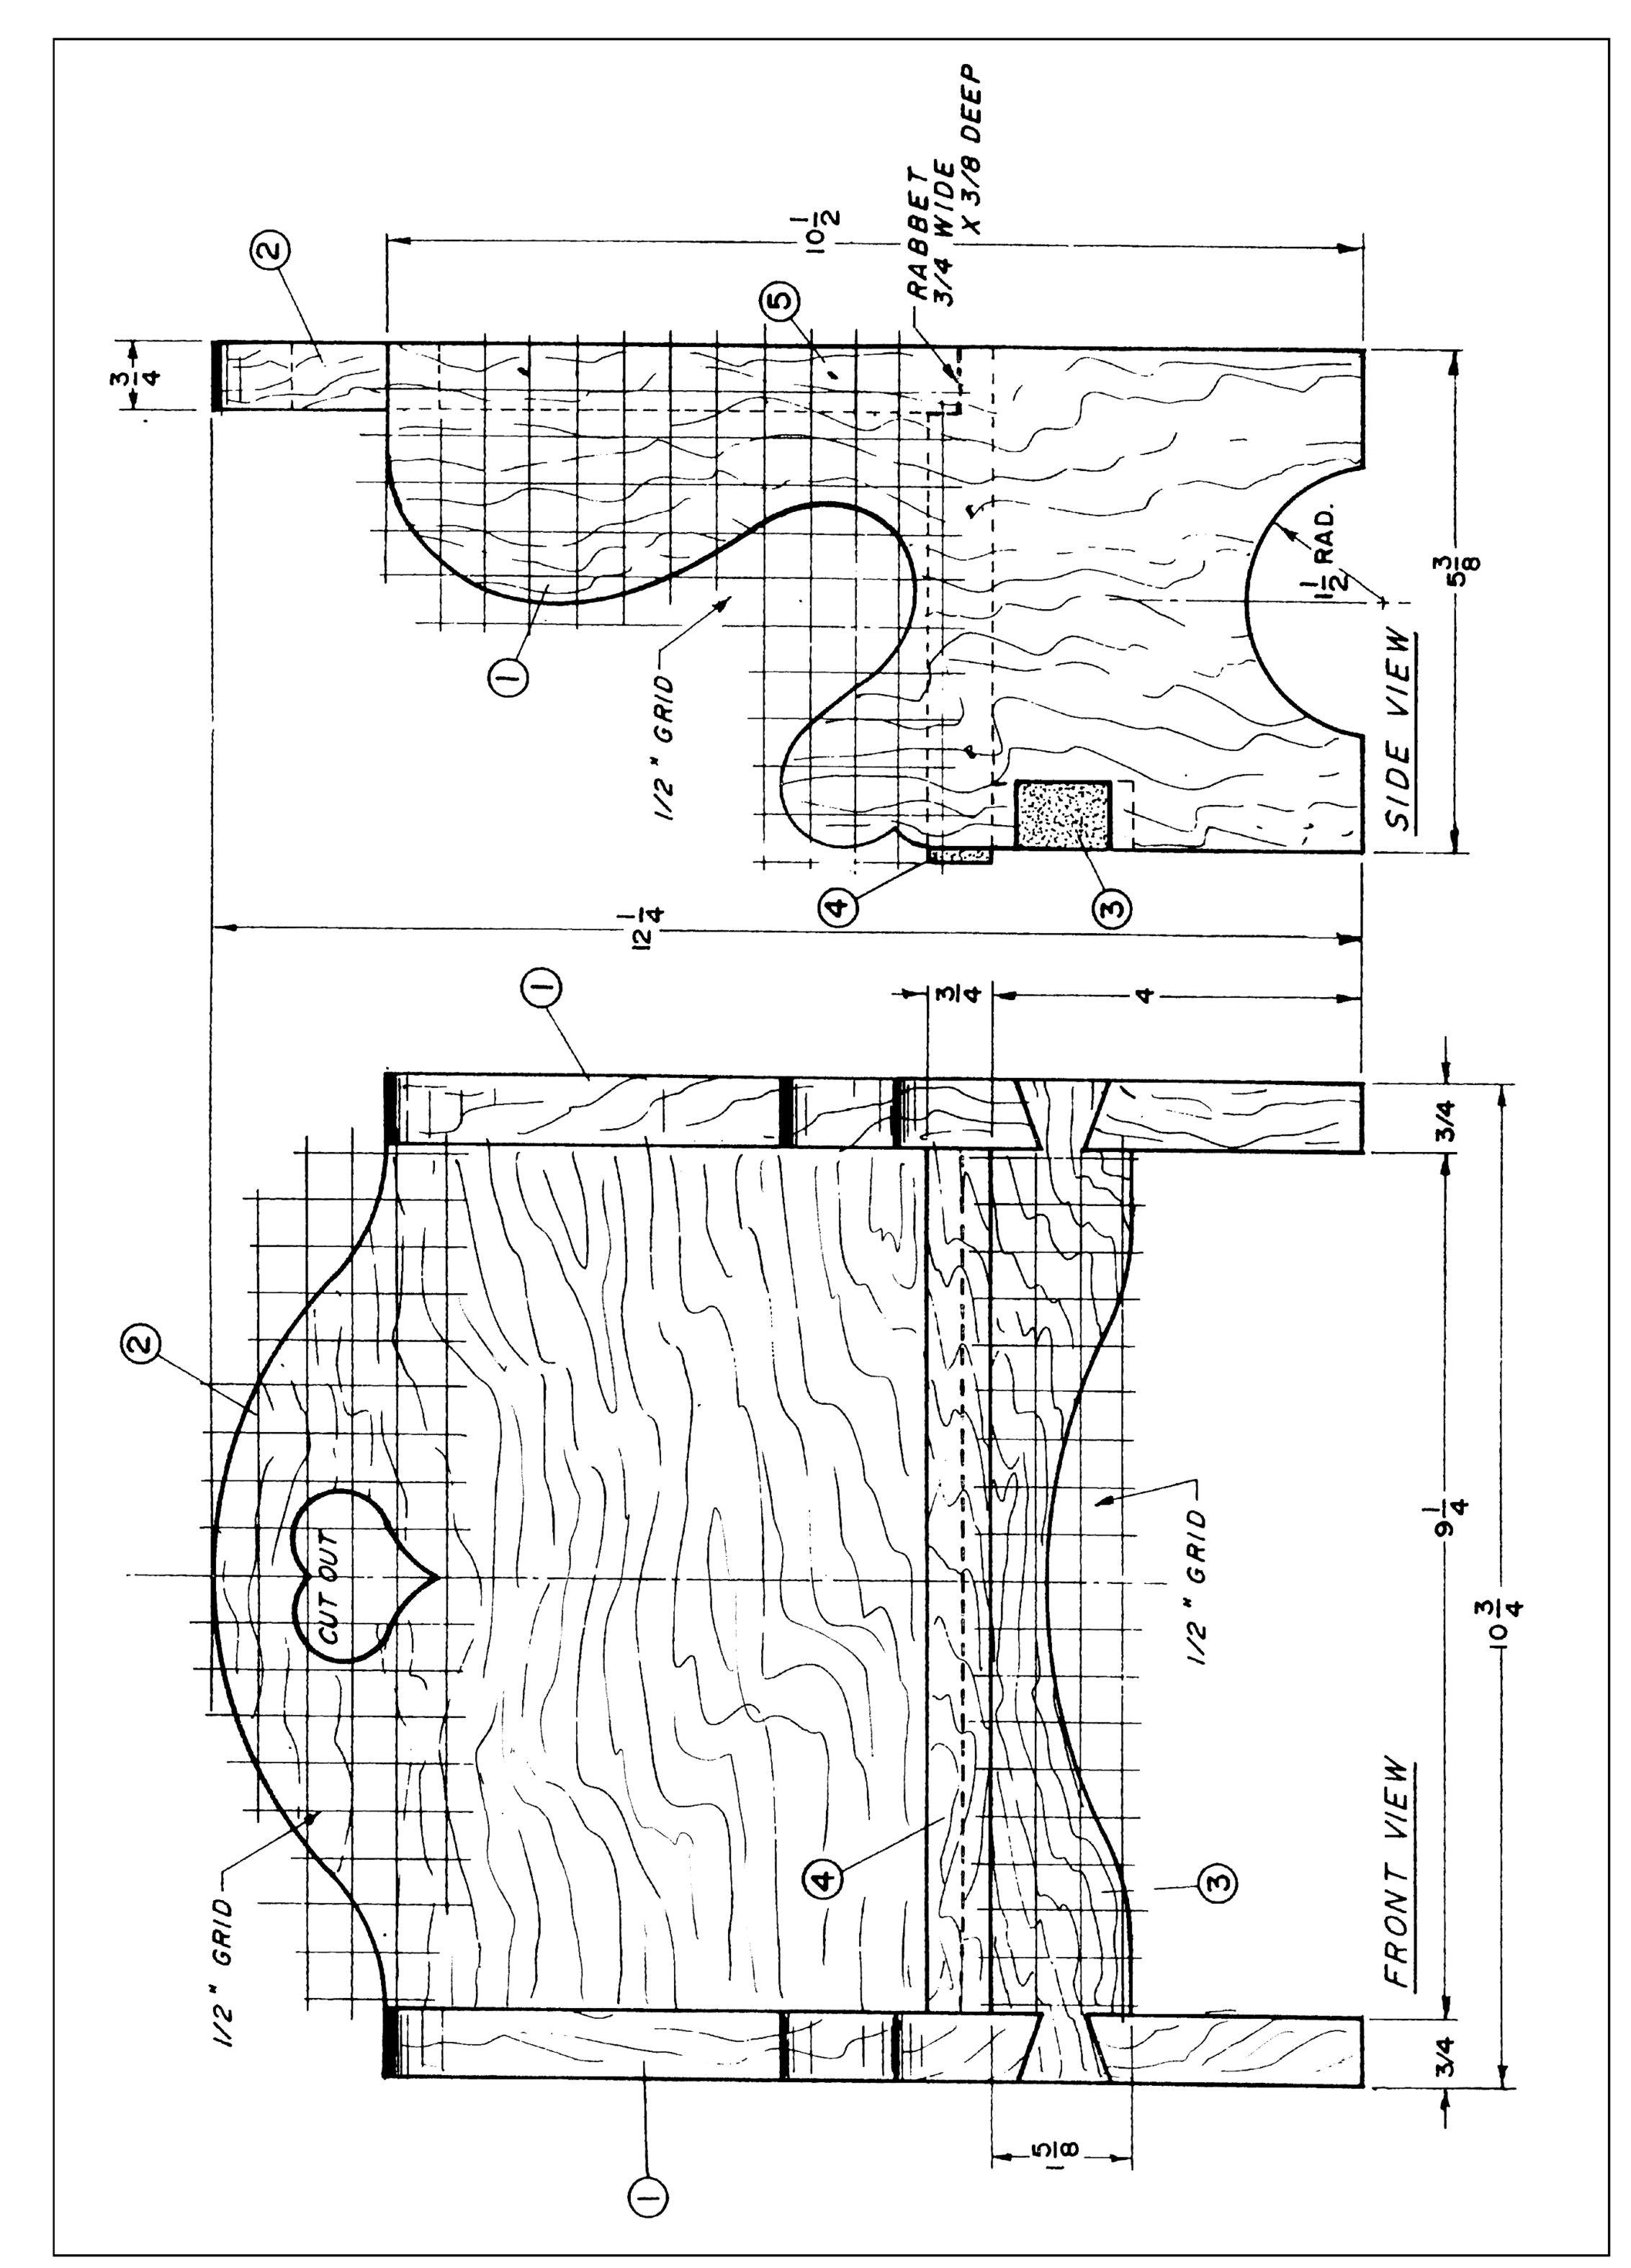 adirondack chair plans dxf cover rental shreveport la wood dollhouse furniture free